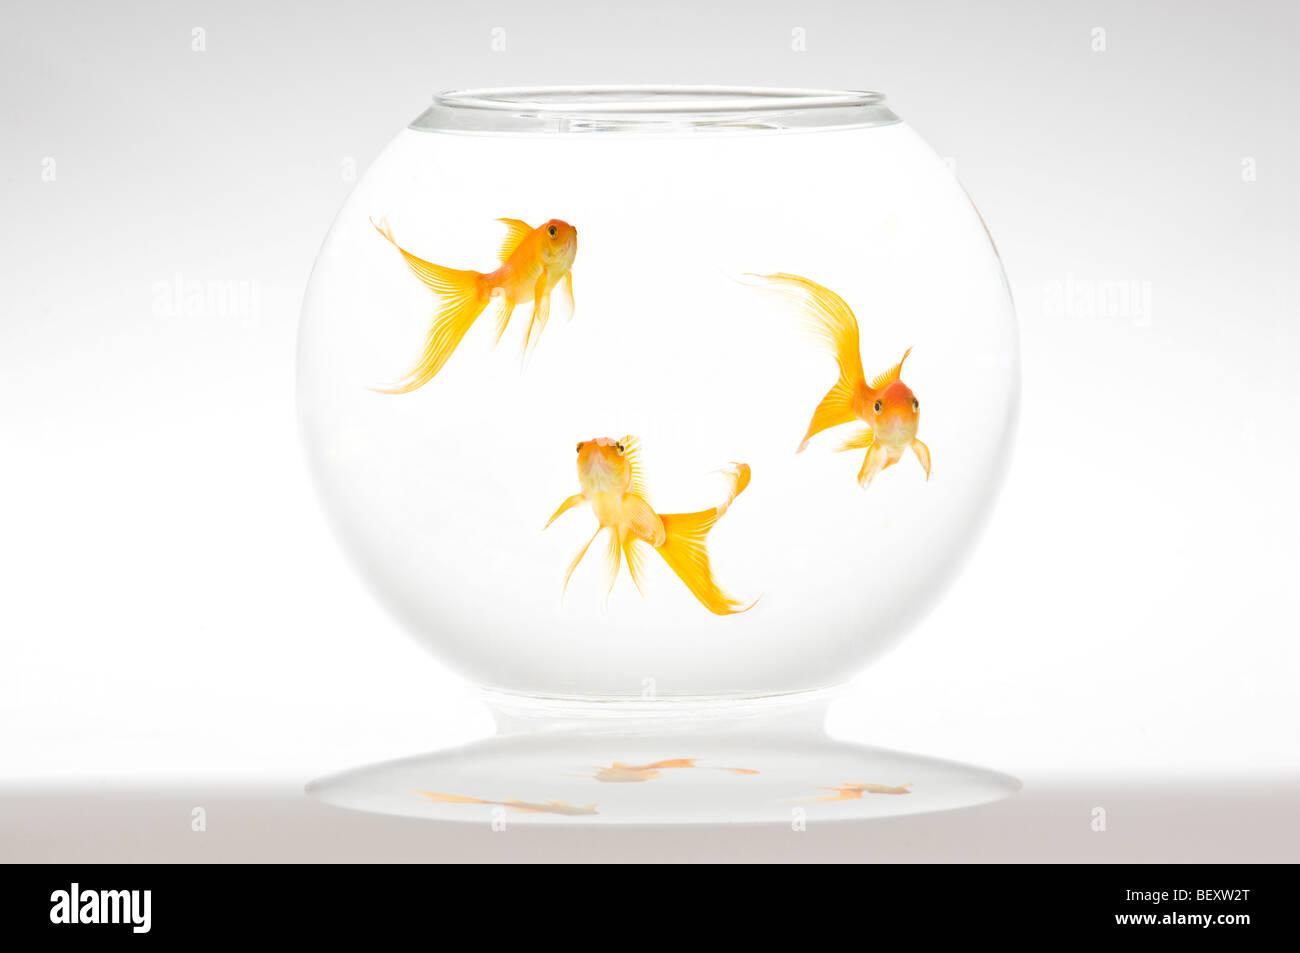 Three fantail goldfish (Carassius auratus) in a bowl. Stock Photo